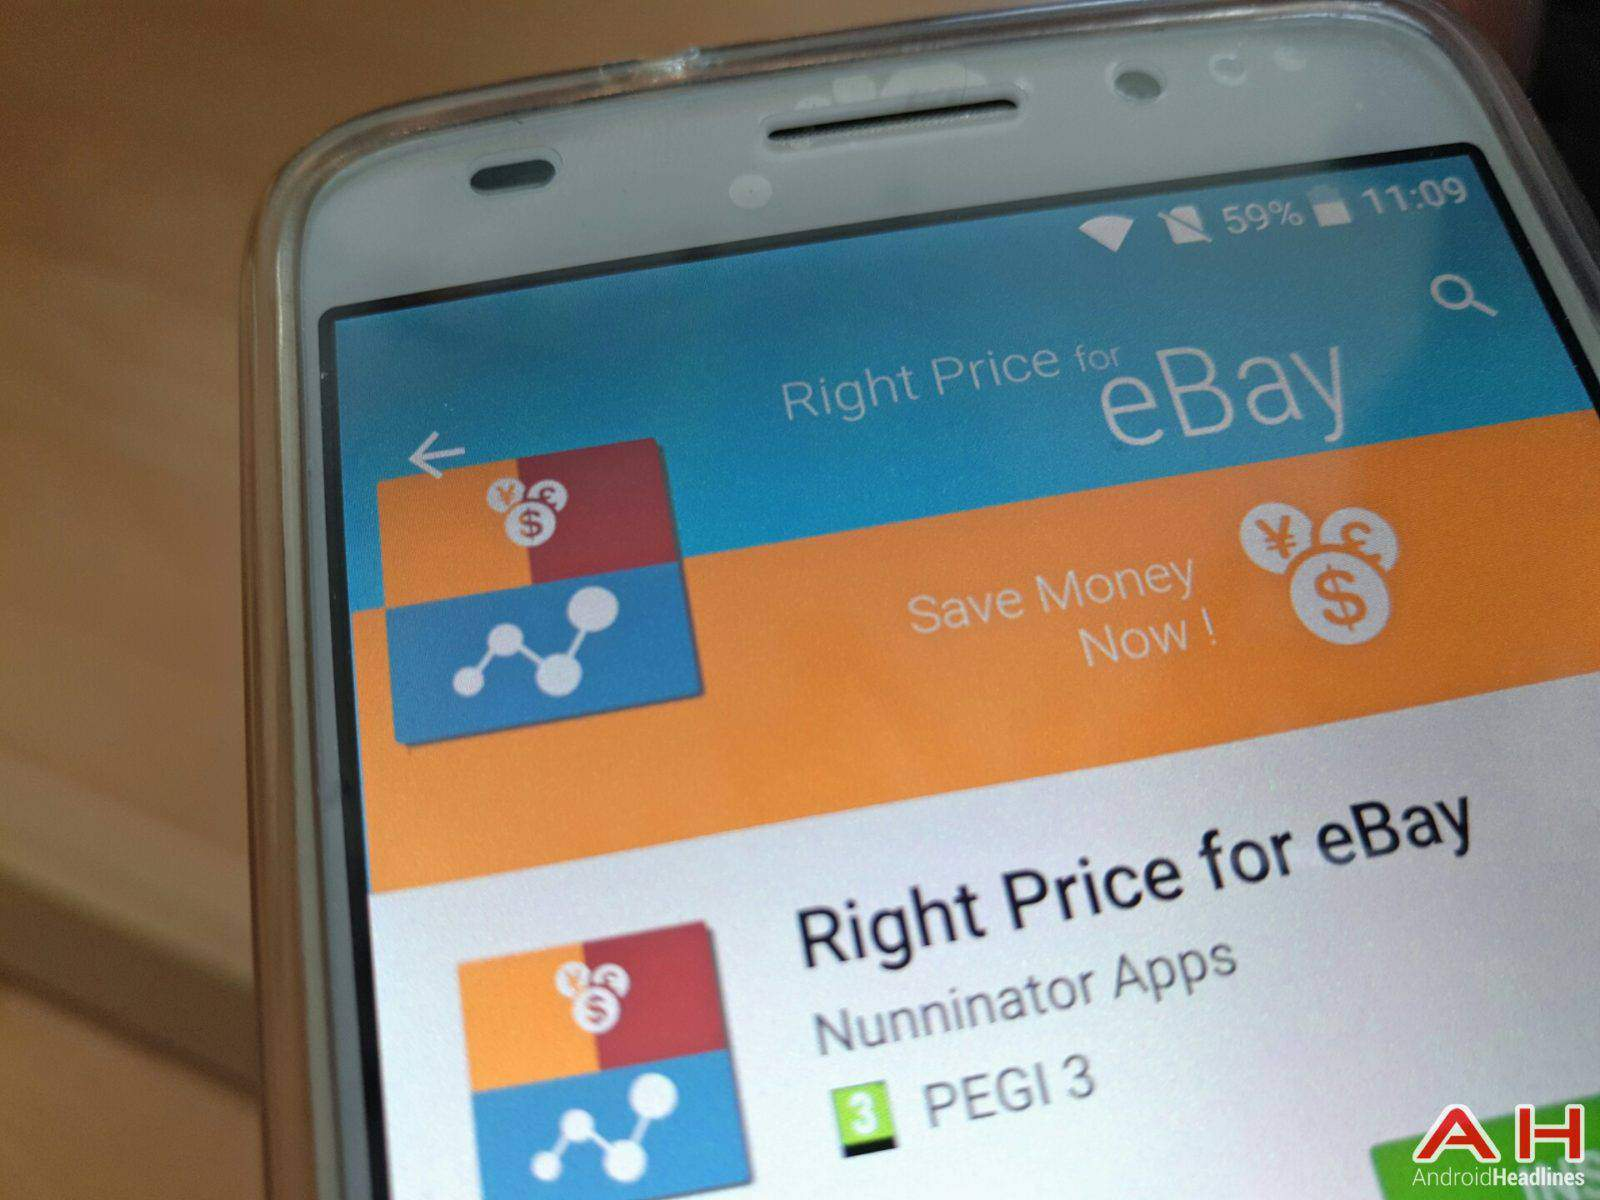 AH Right Price for eBay app_1